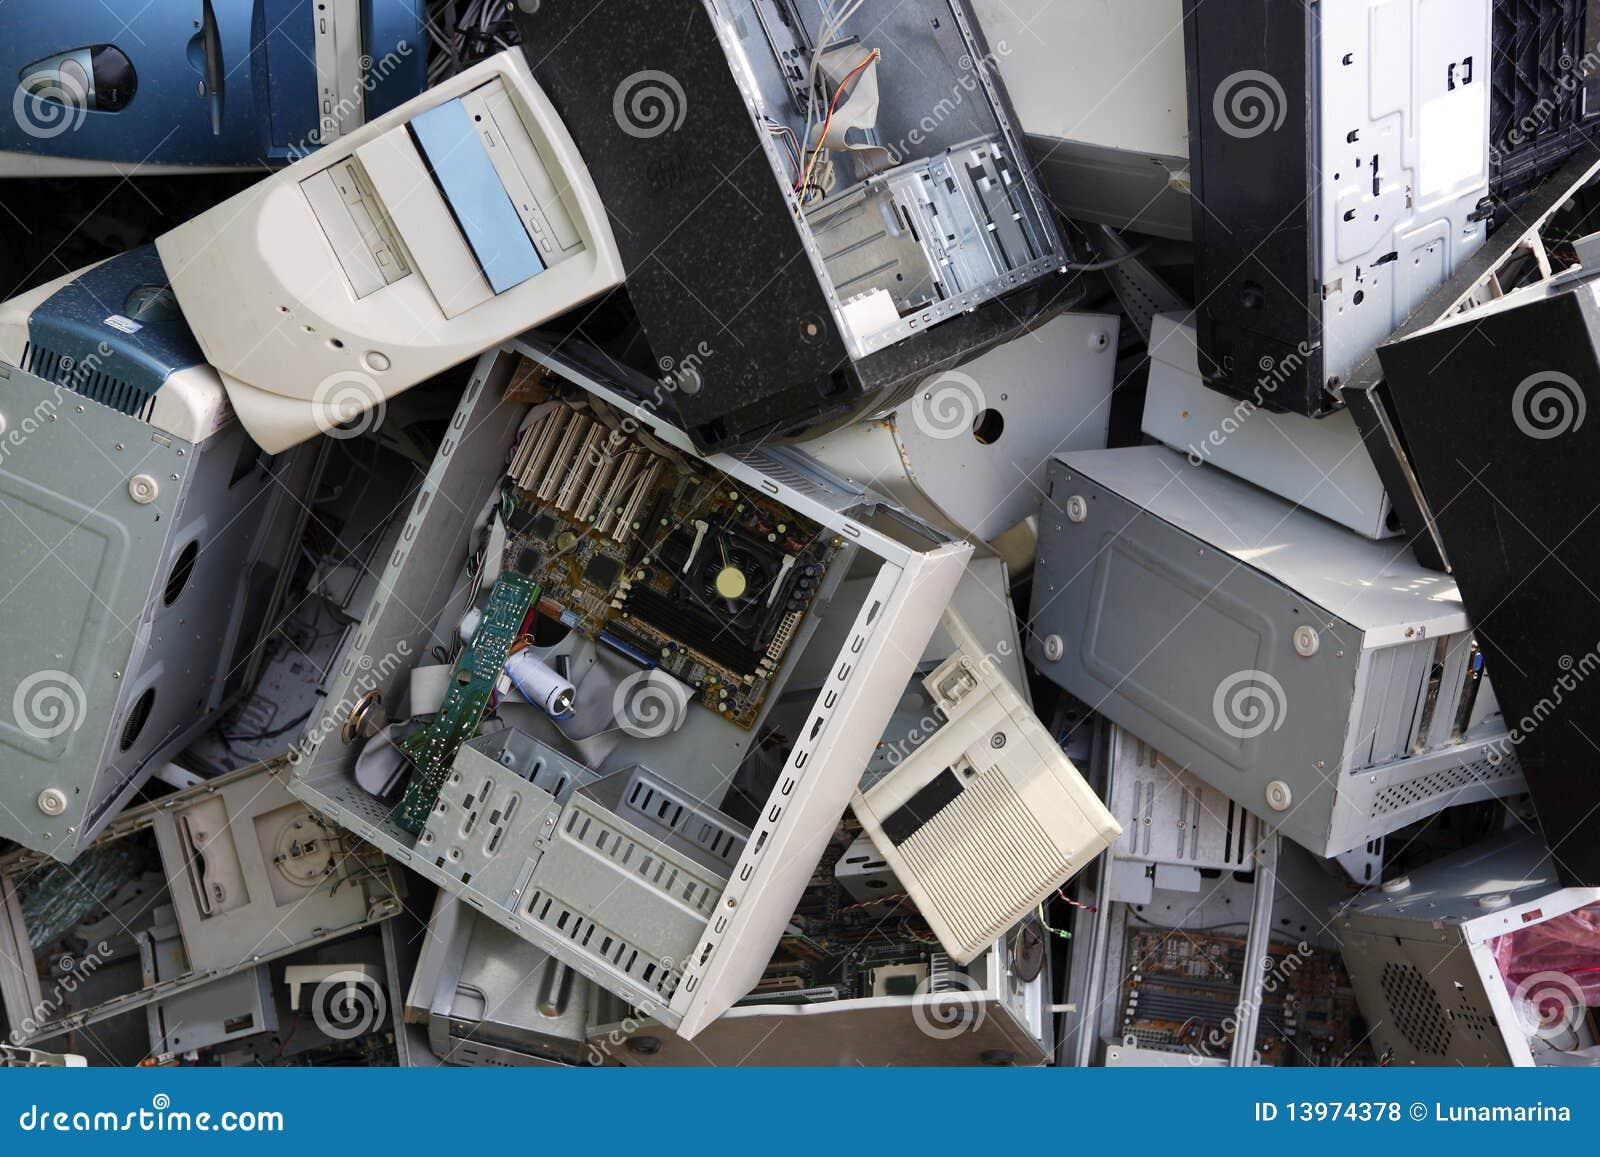 Download Hardware Computer Desktop Recycle Industry Stock Photo - Image of heap, antique: 13974378